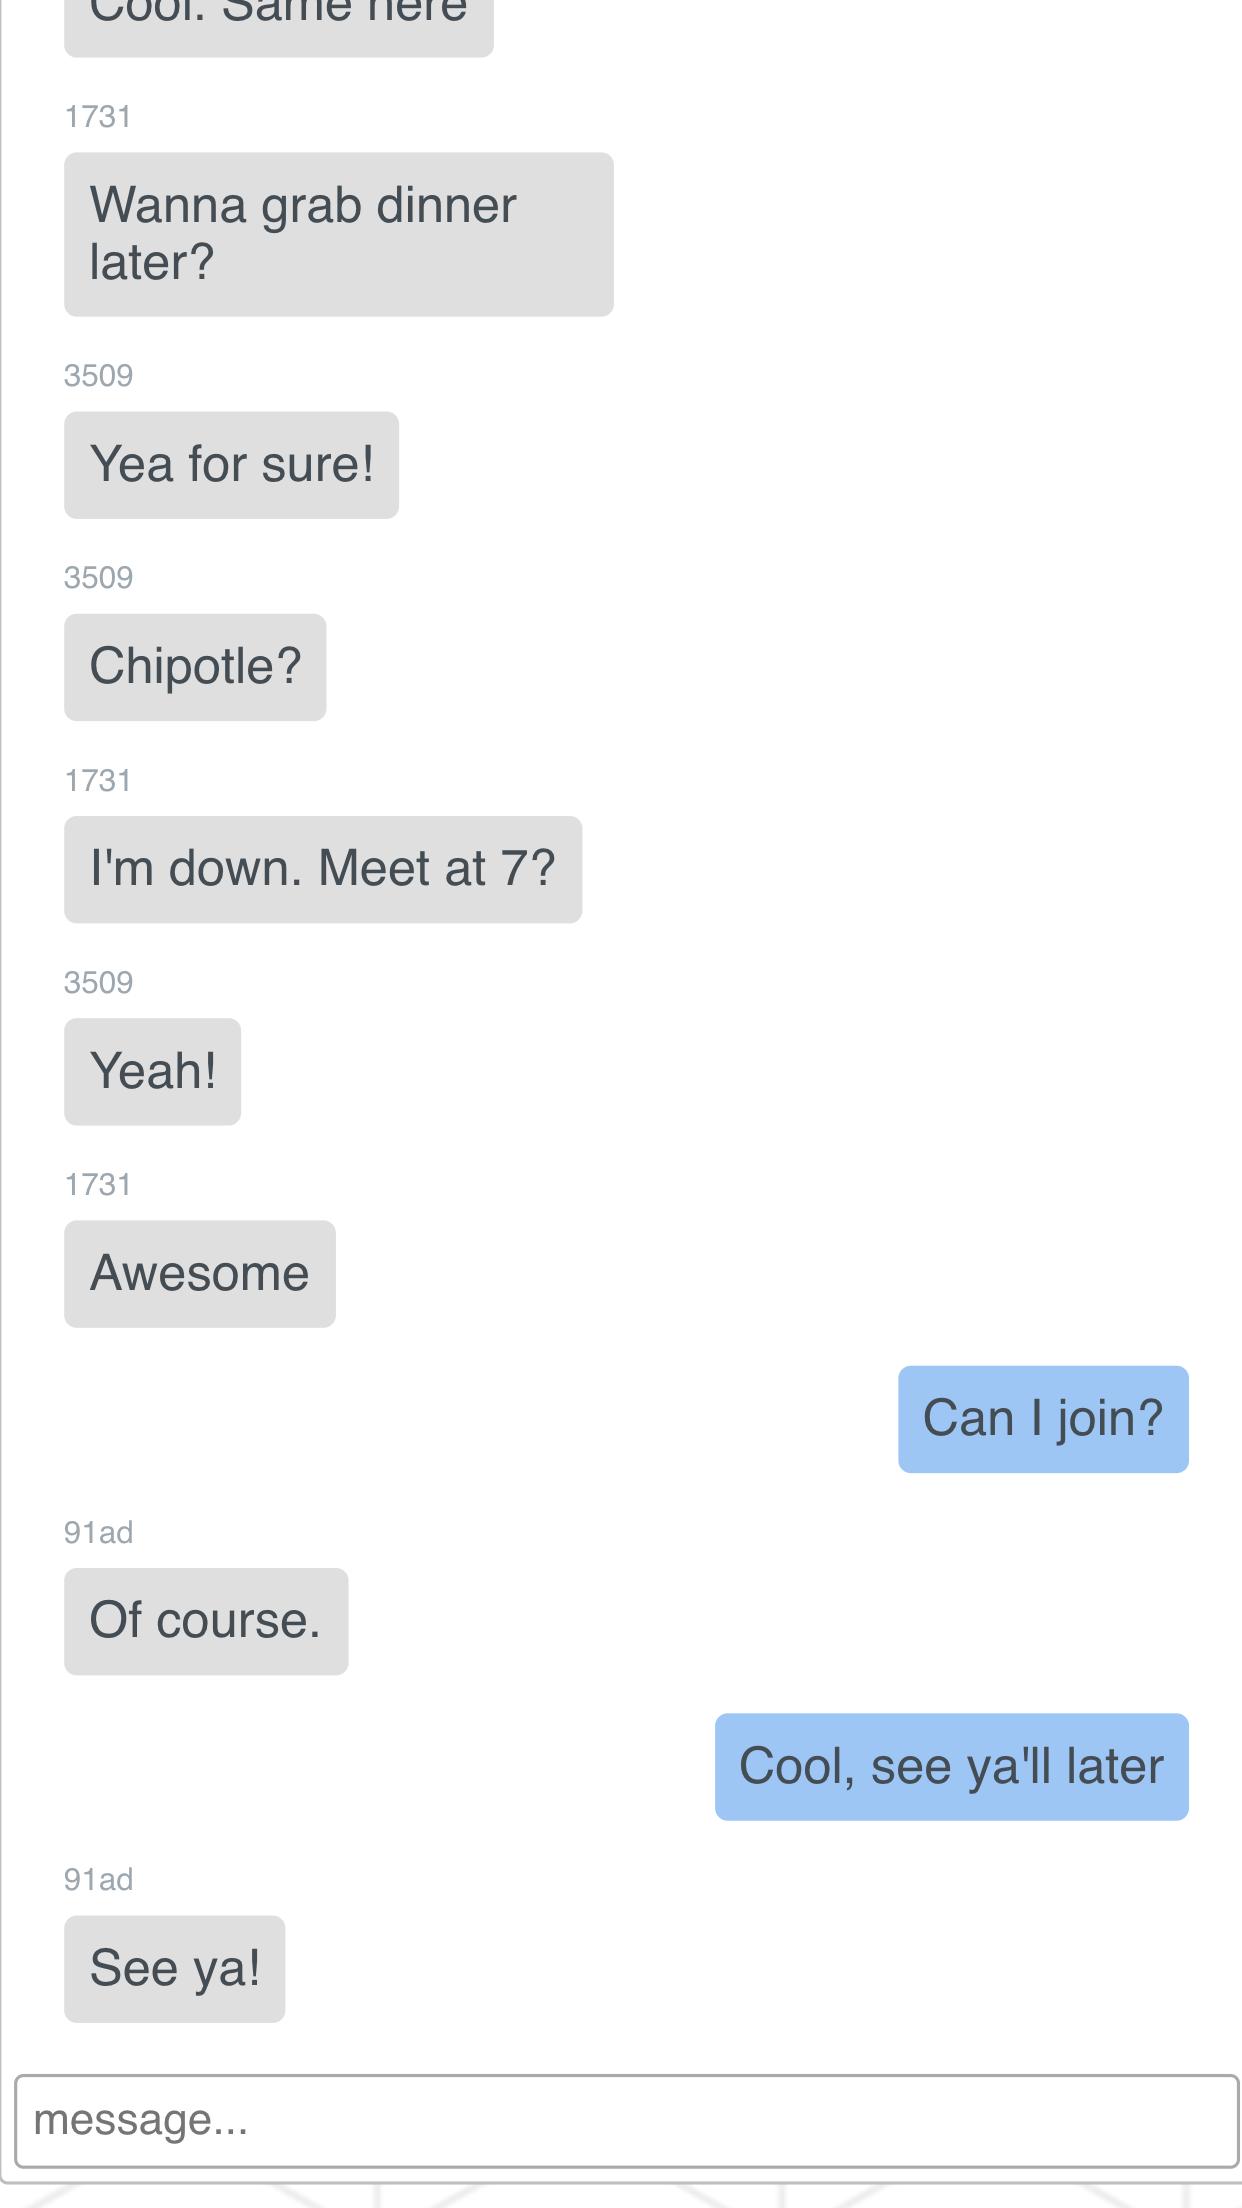 Vue js Chat Basic Tutorial